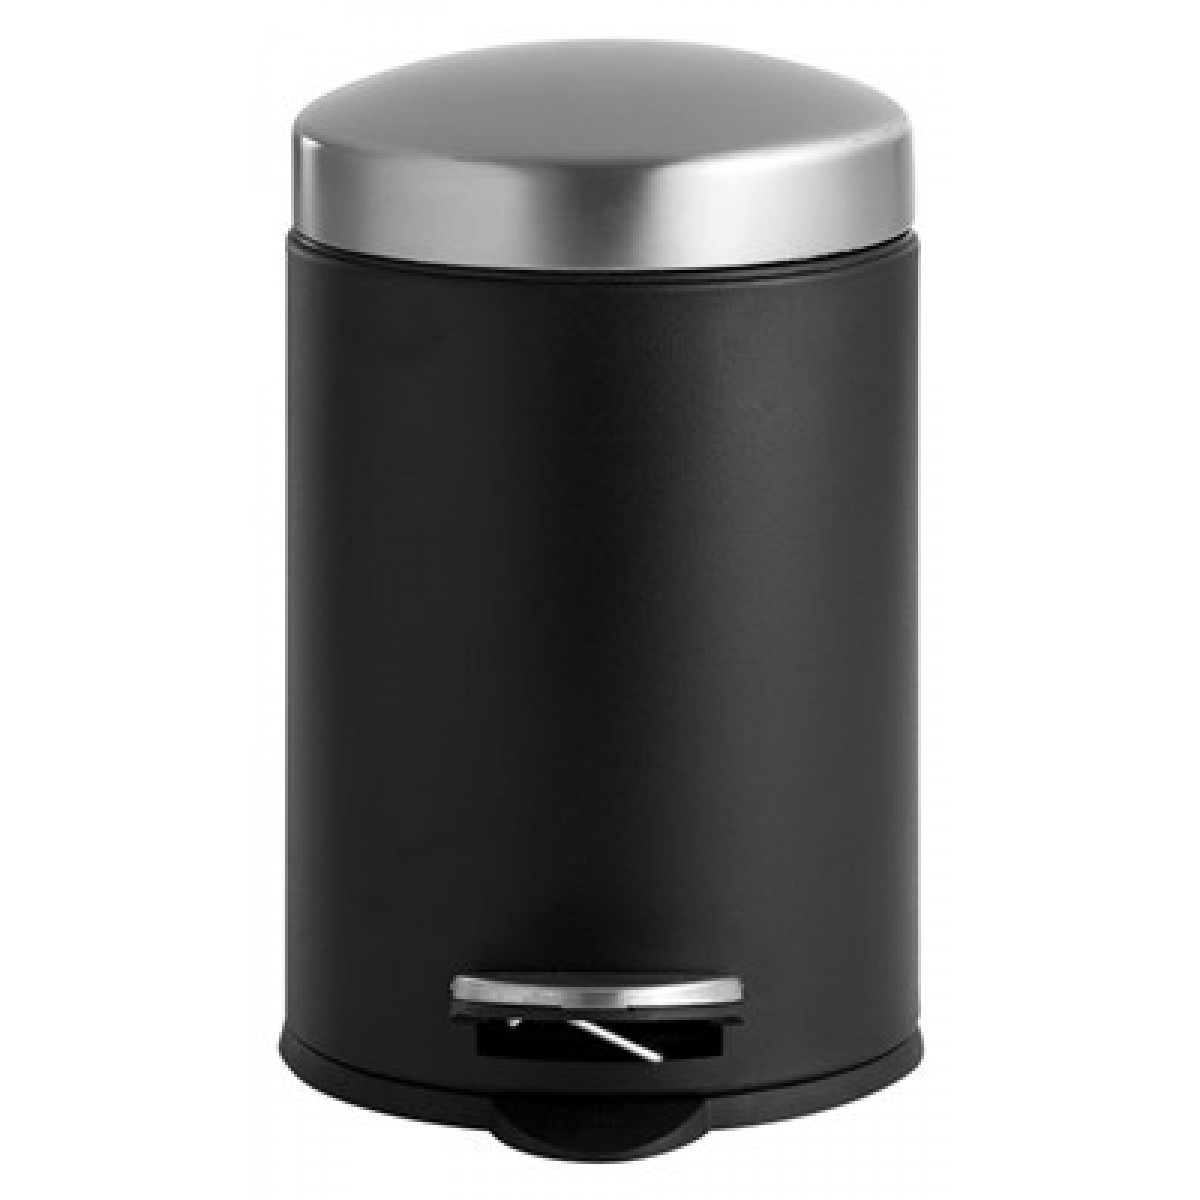 DAY Pedalspand sort/stål m. softclose 3 L